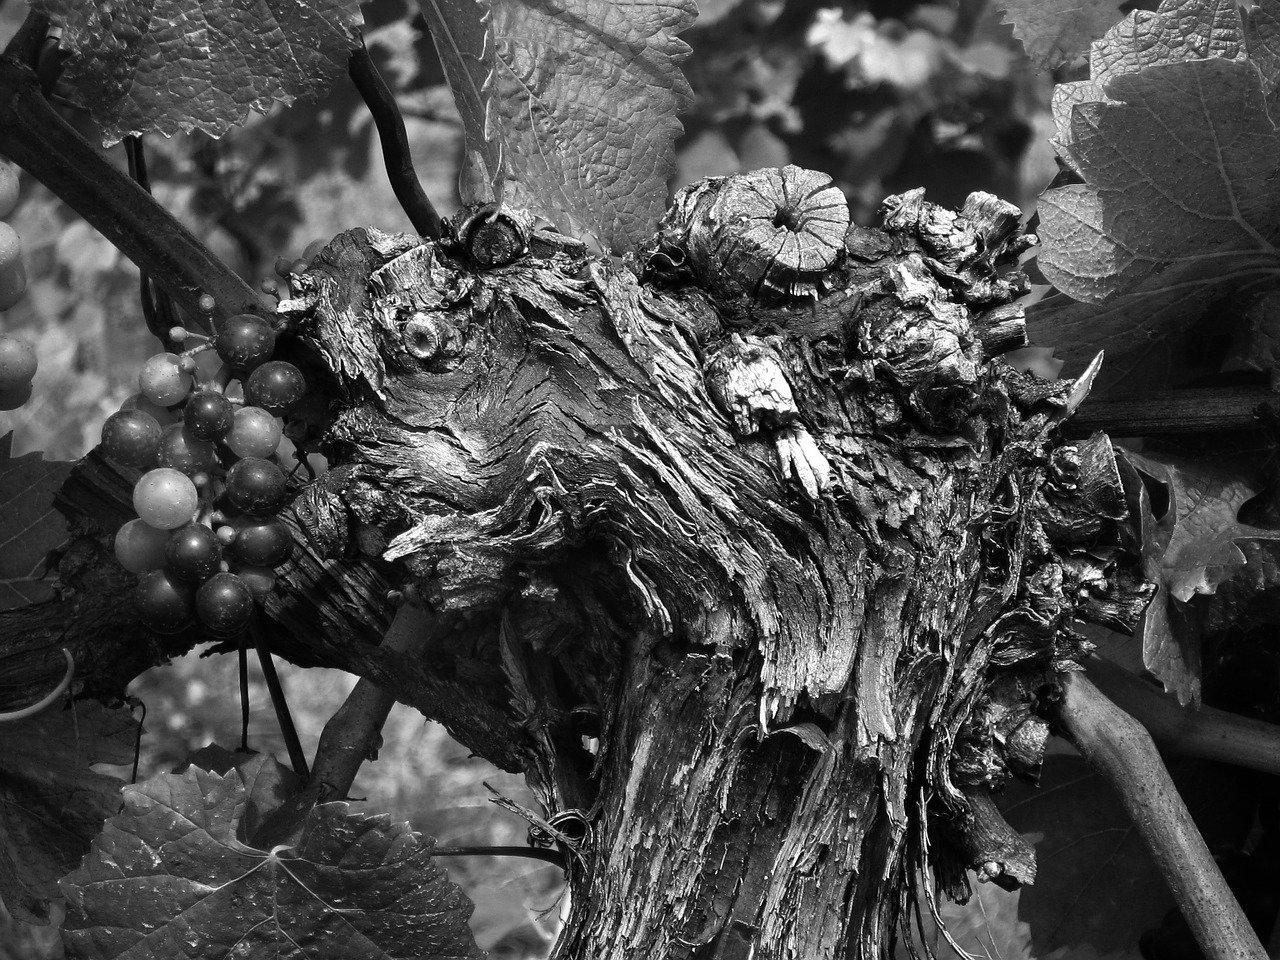 grape-95723_1280